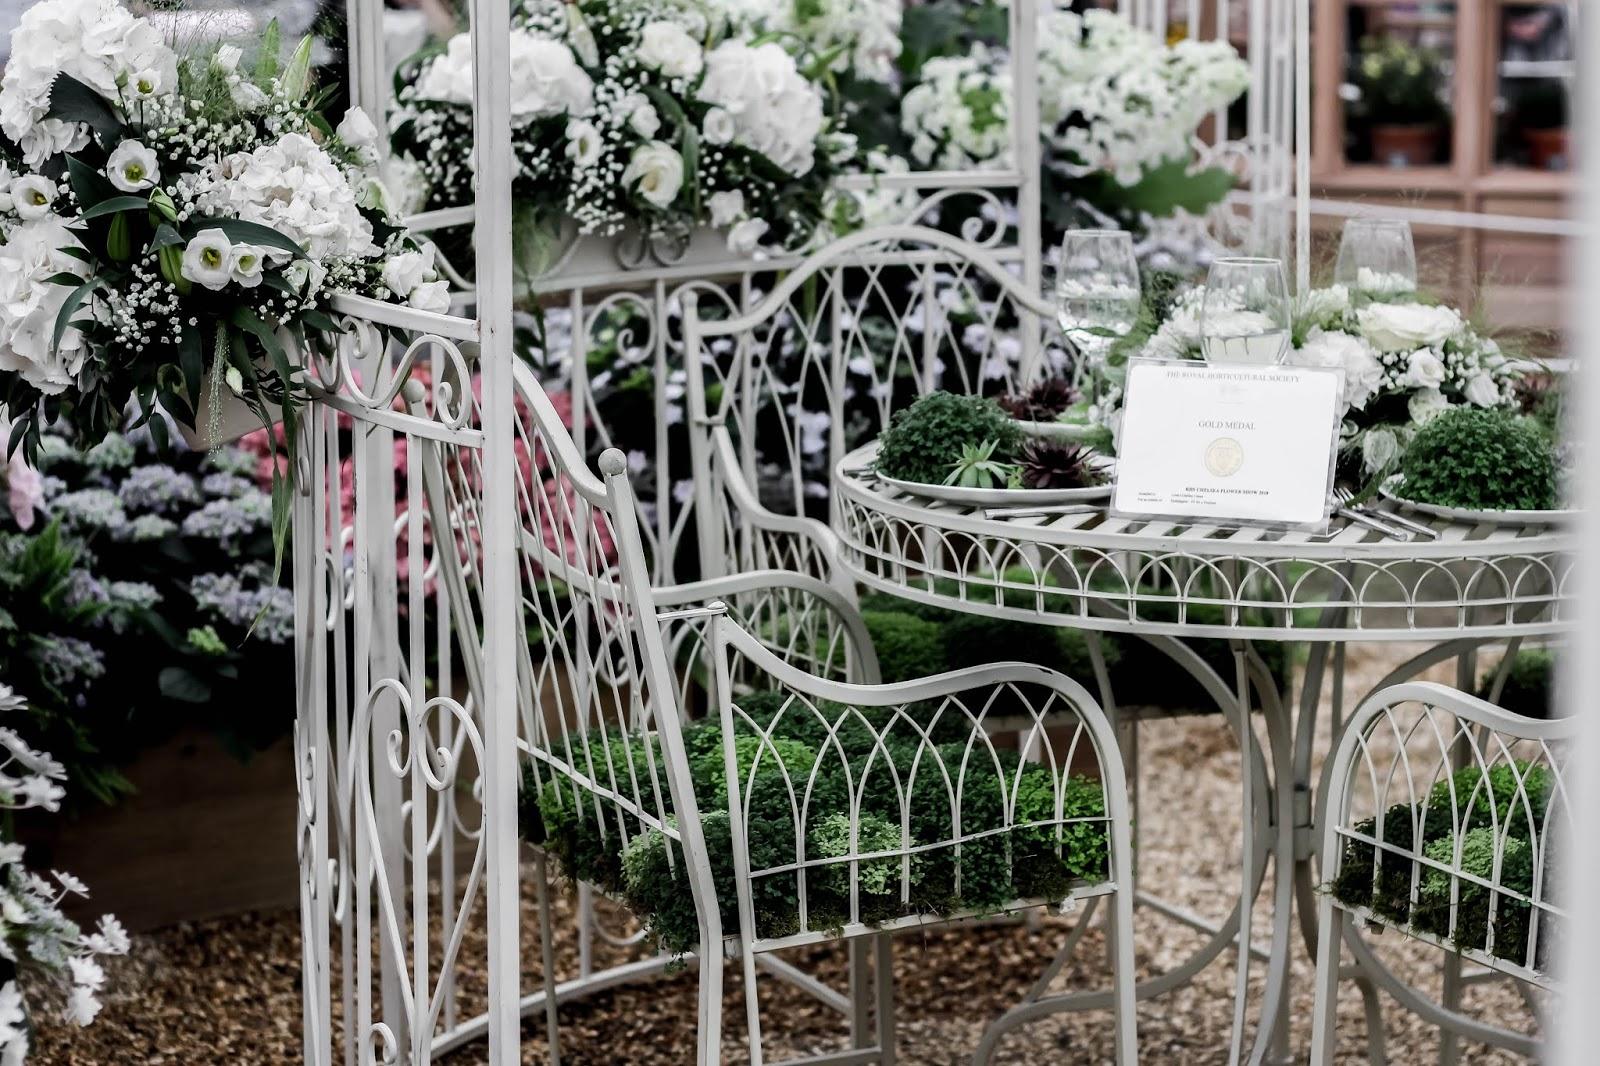 Award Winning Exhibit at Chelsea Flower Show 2018